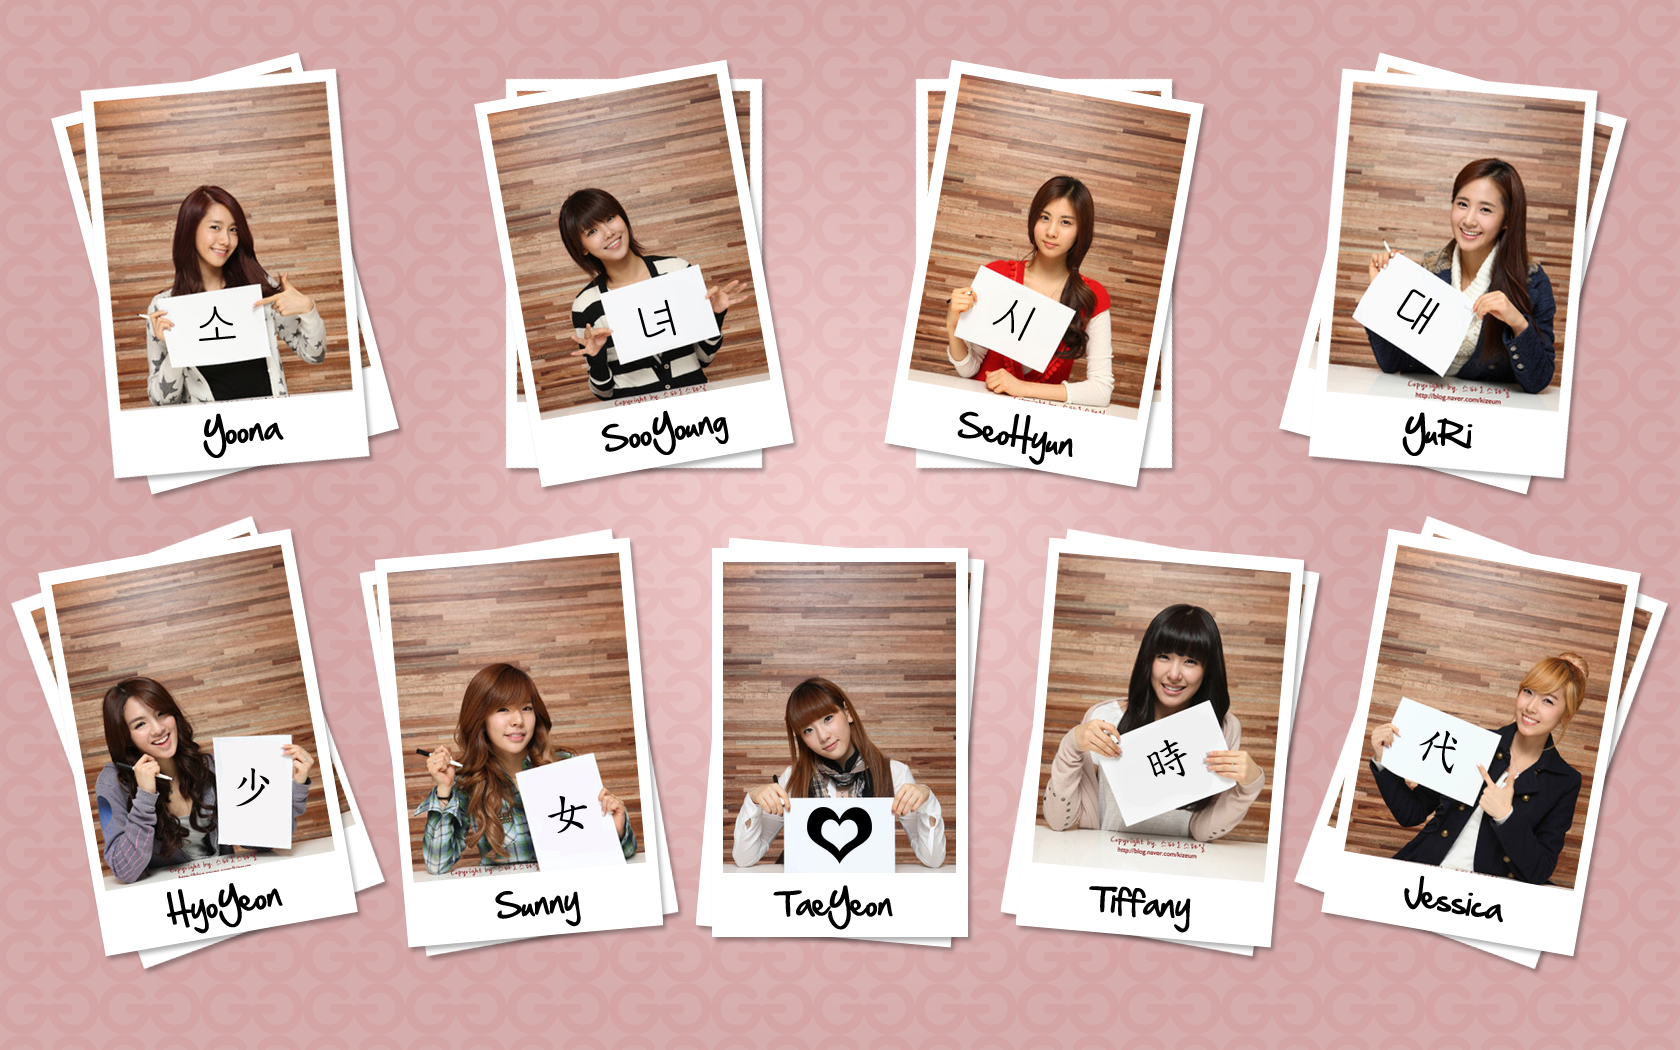 Snsd Wallpaper on Girls Generation Snsd Celebrity Hd Wallpaper   Girls   817758